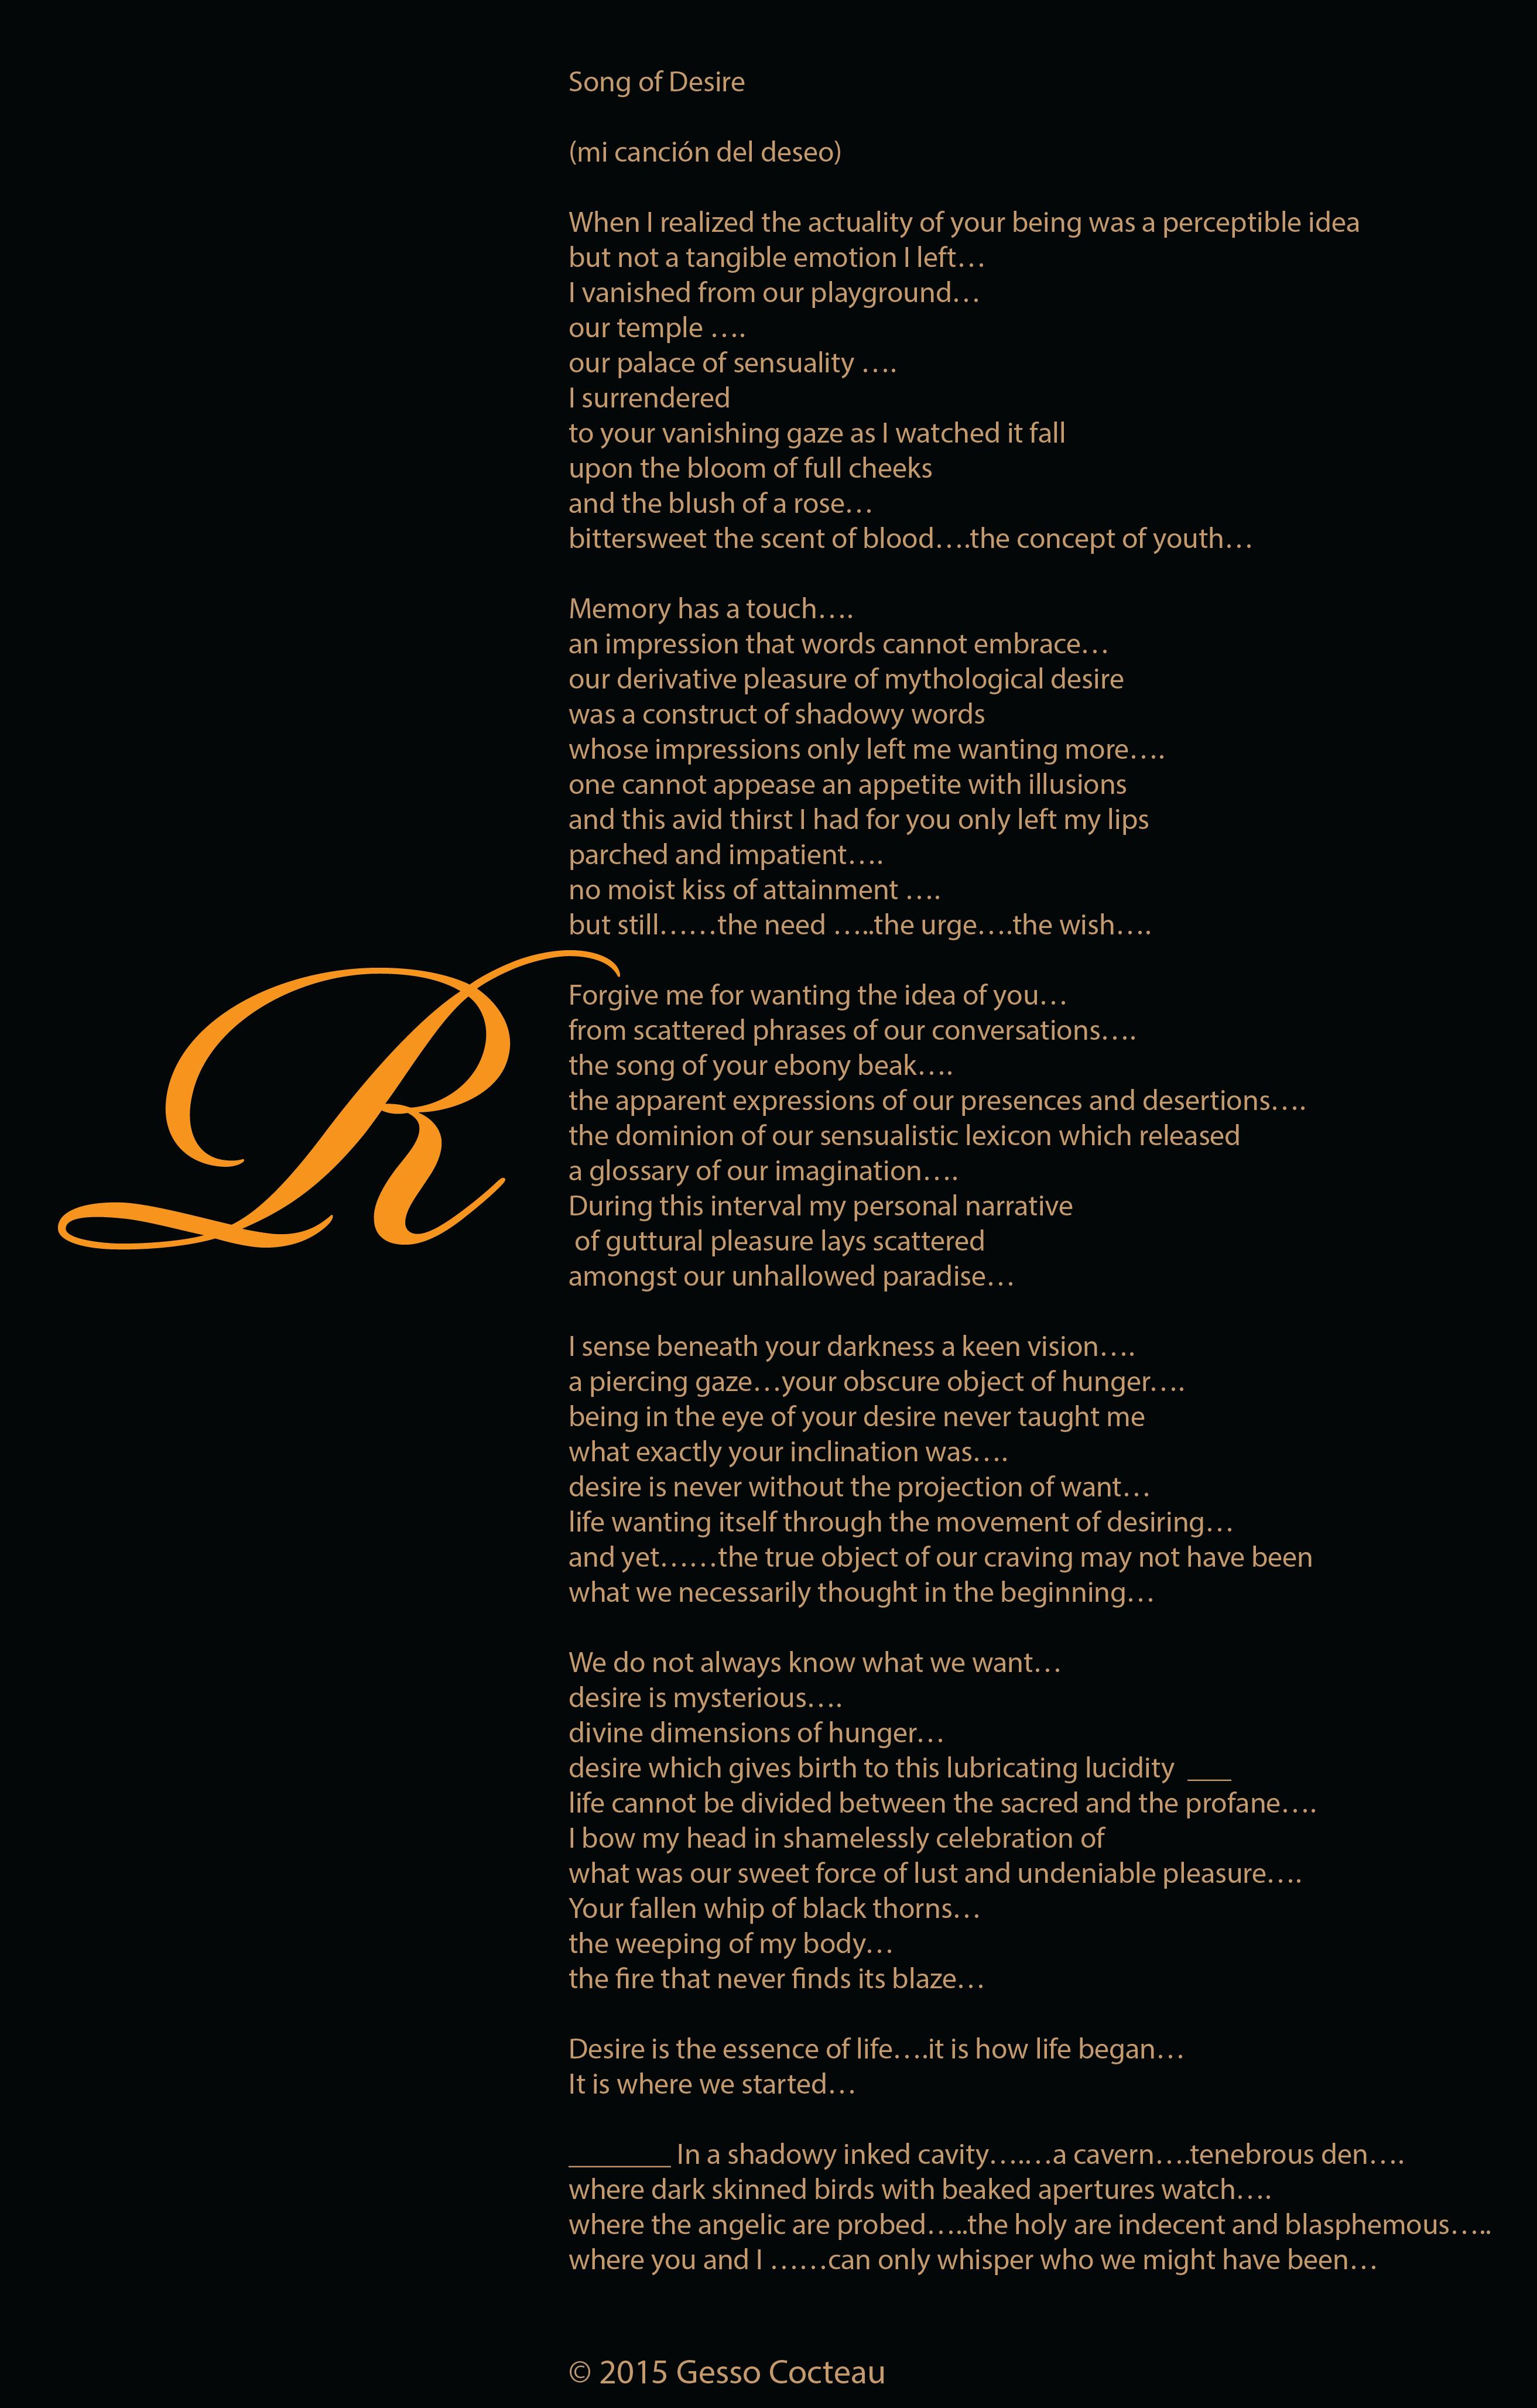 Song of Desire | gessococteau